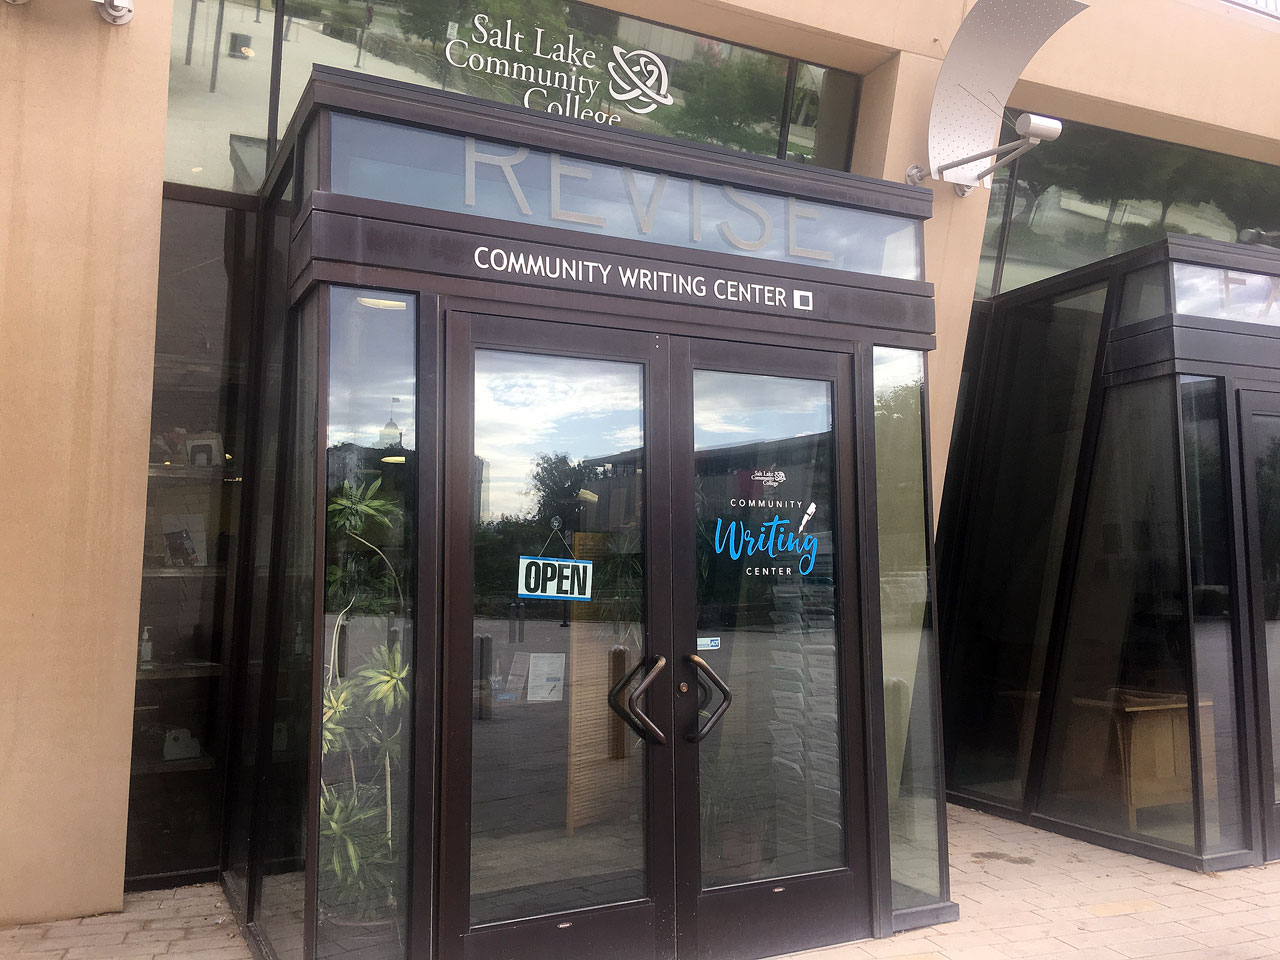 Community Writing Center entrance